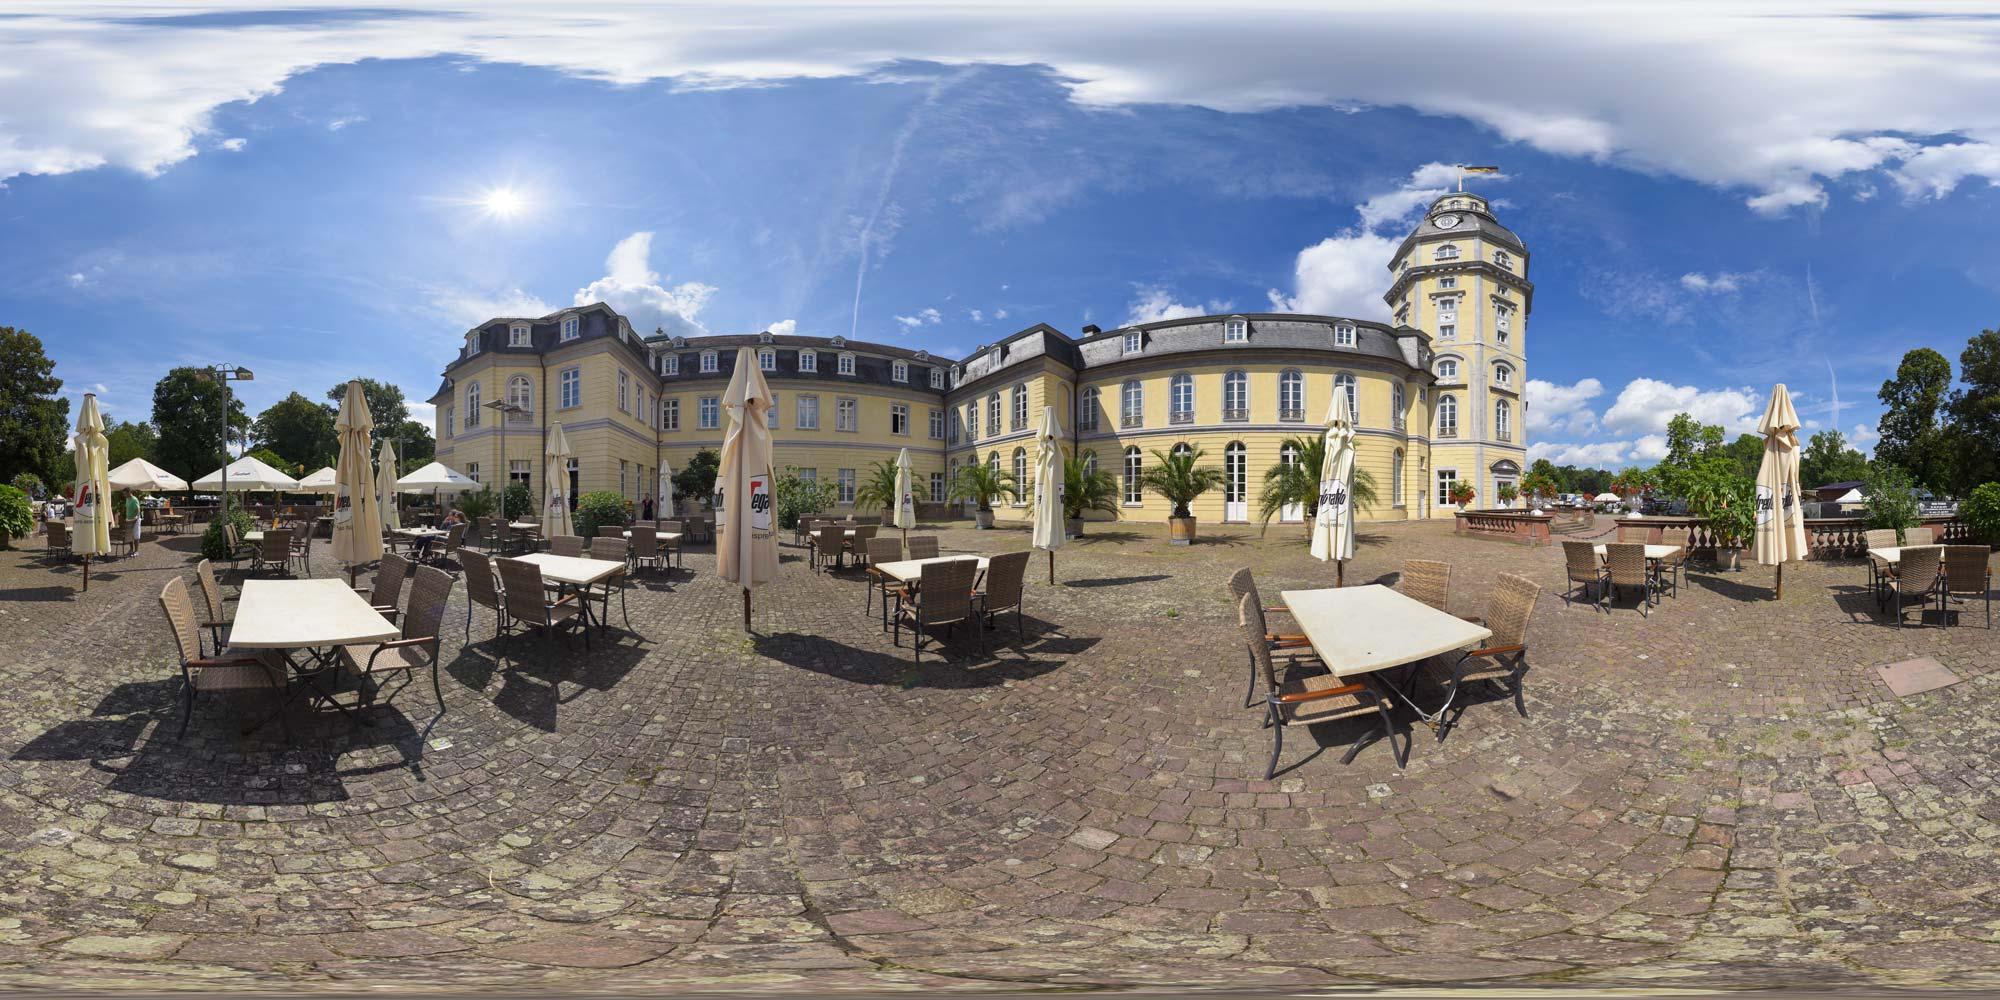 Kubische Panoramen Panorama Foto Karlsruhe Schloss Karlsruhe Cafe